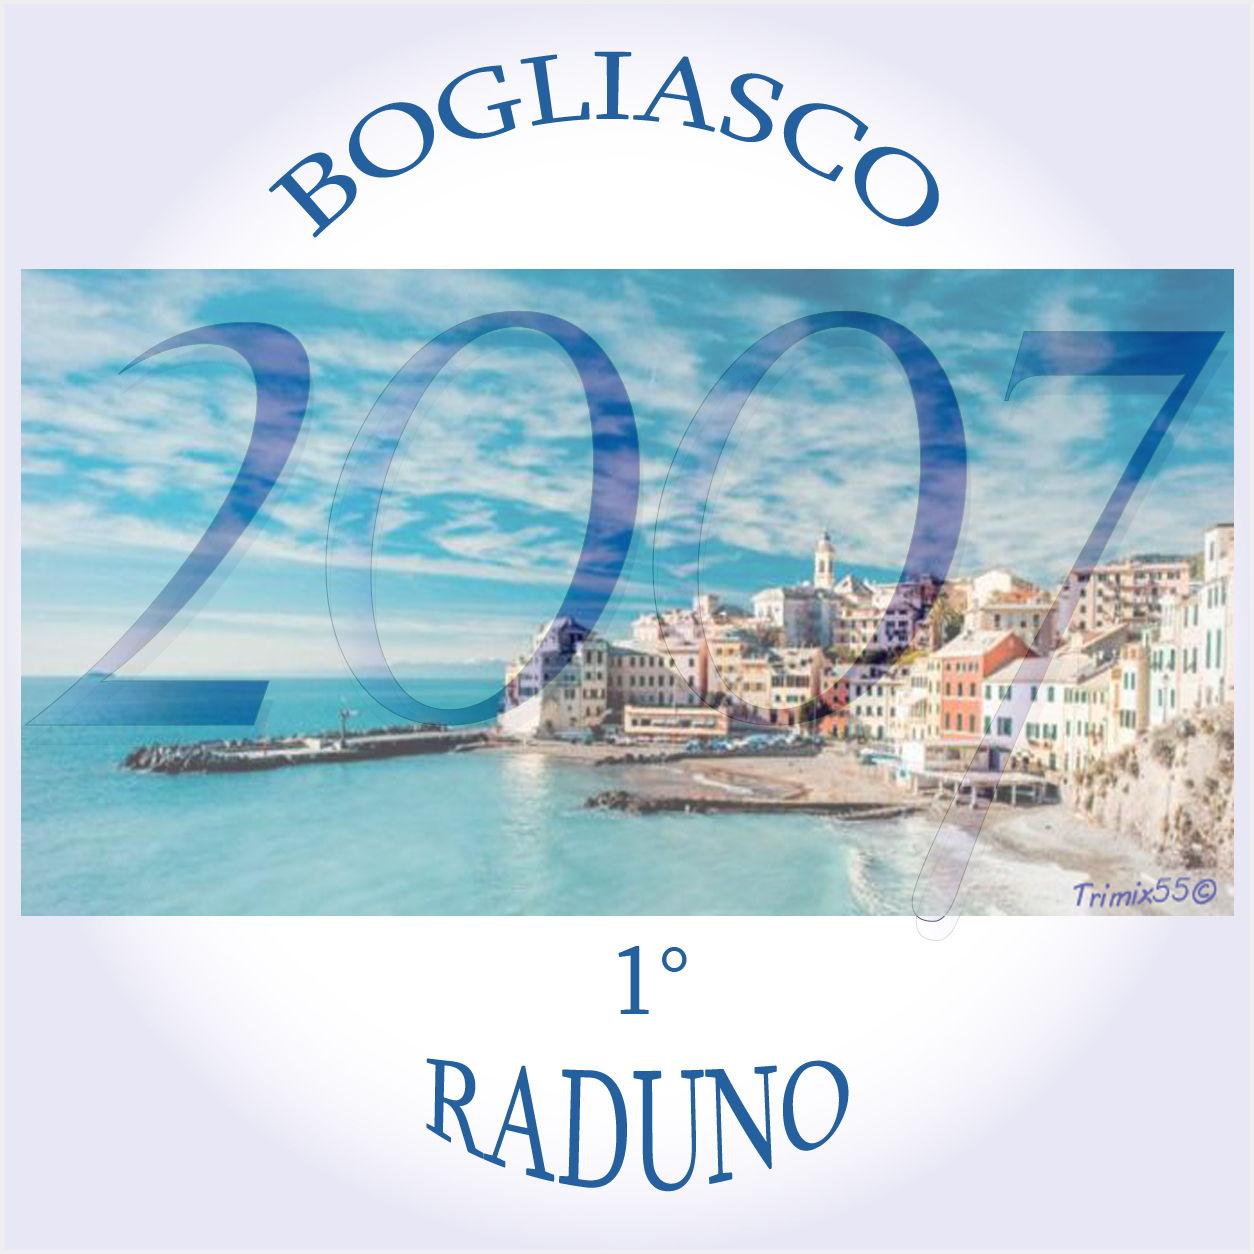 1° Raduno Bogliasco 2007